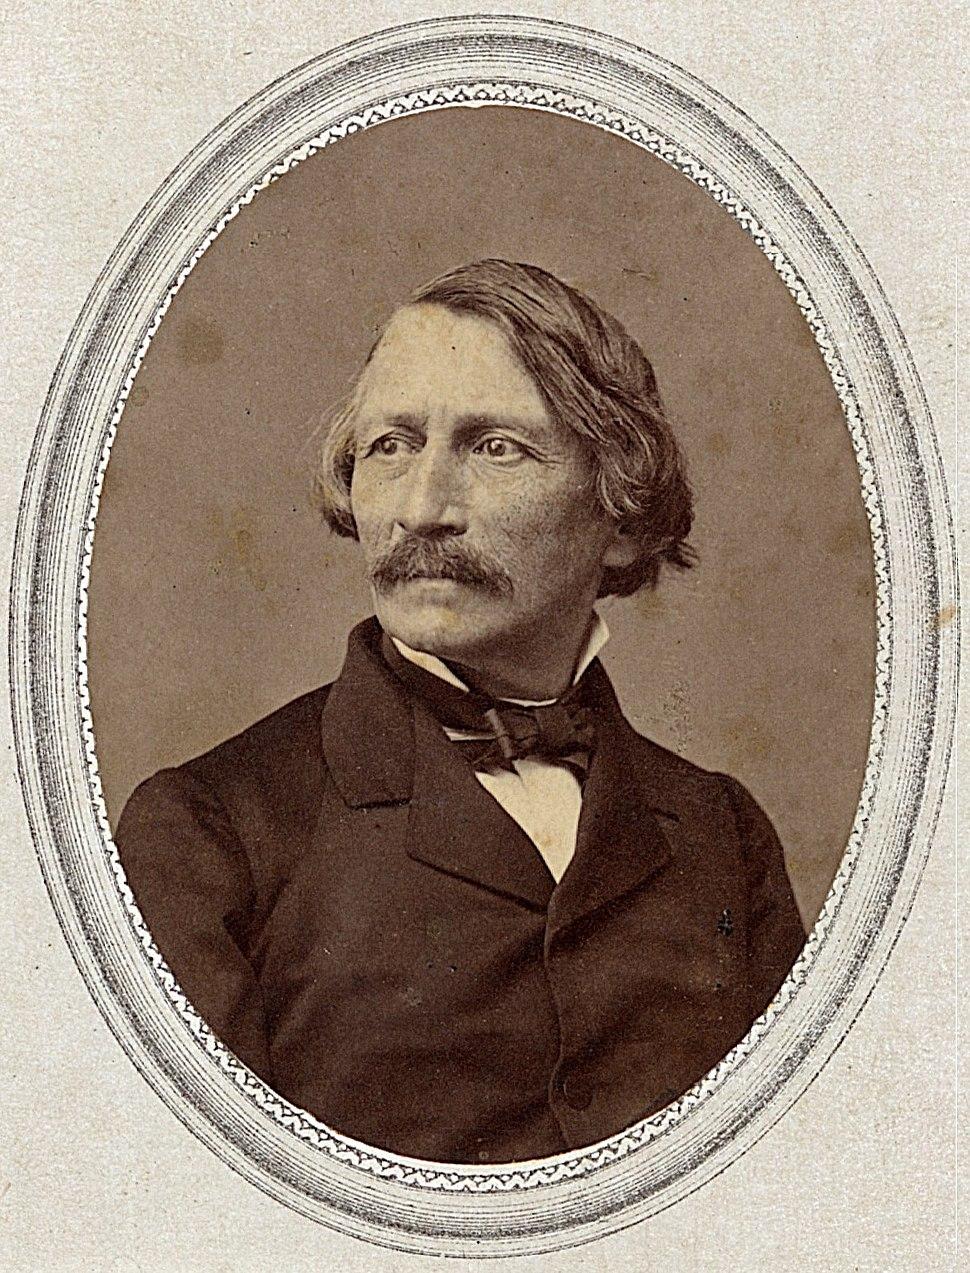 ETH-BIB-Semper, Gottfried (1803-1879)-Portrait-Portr 10869.tif (cropped)